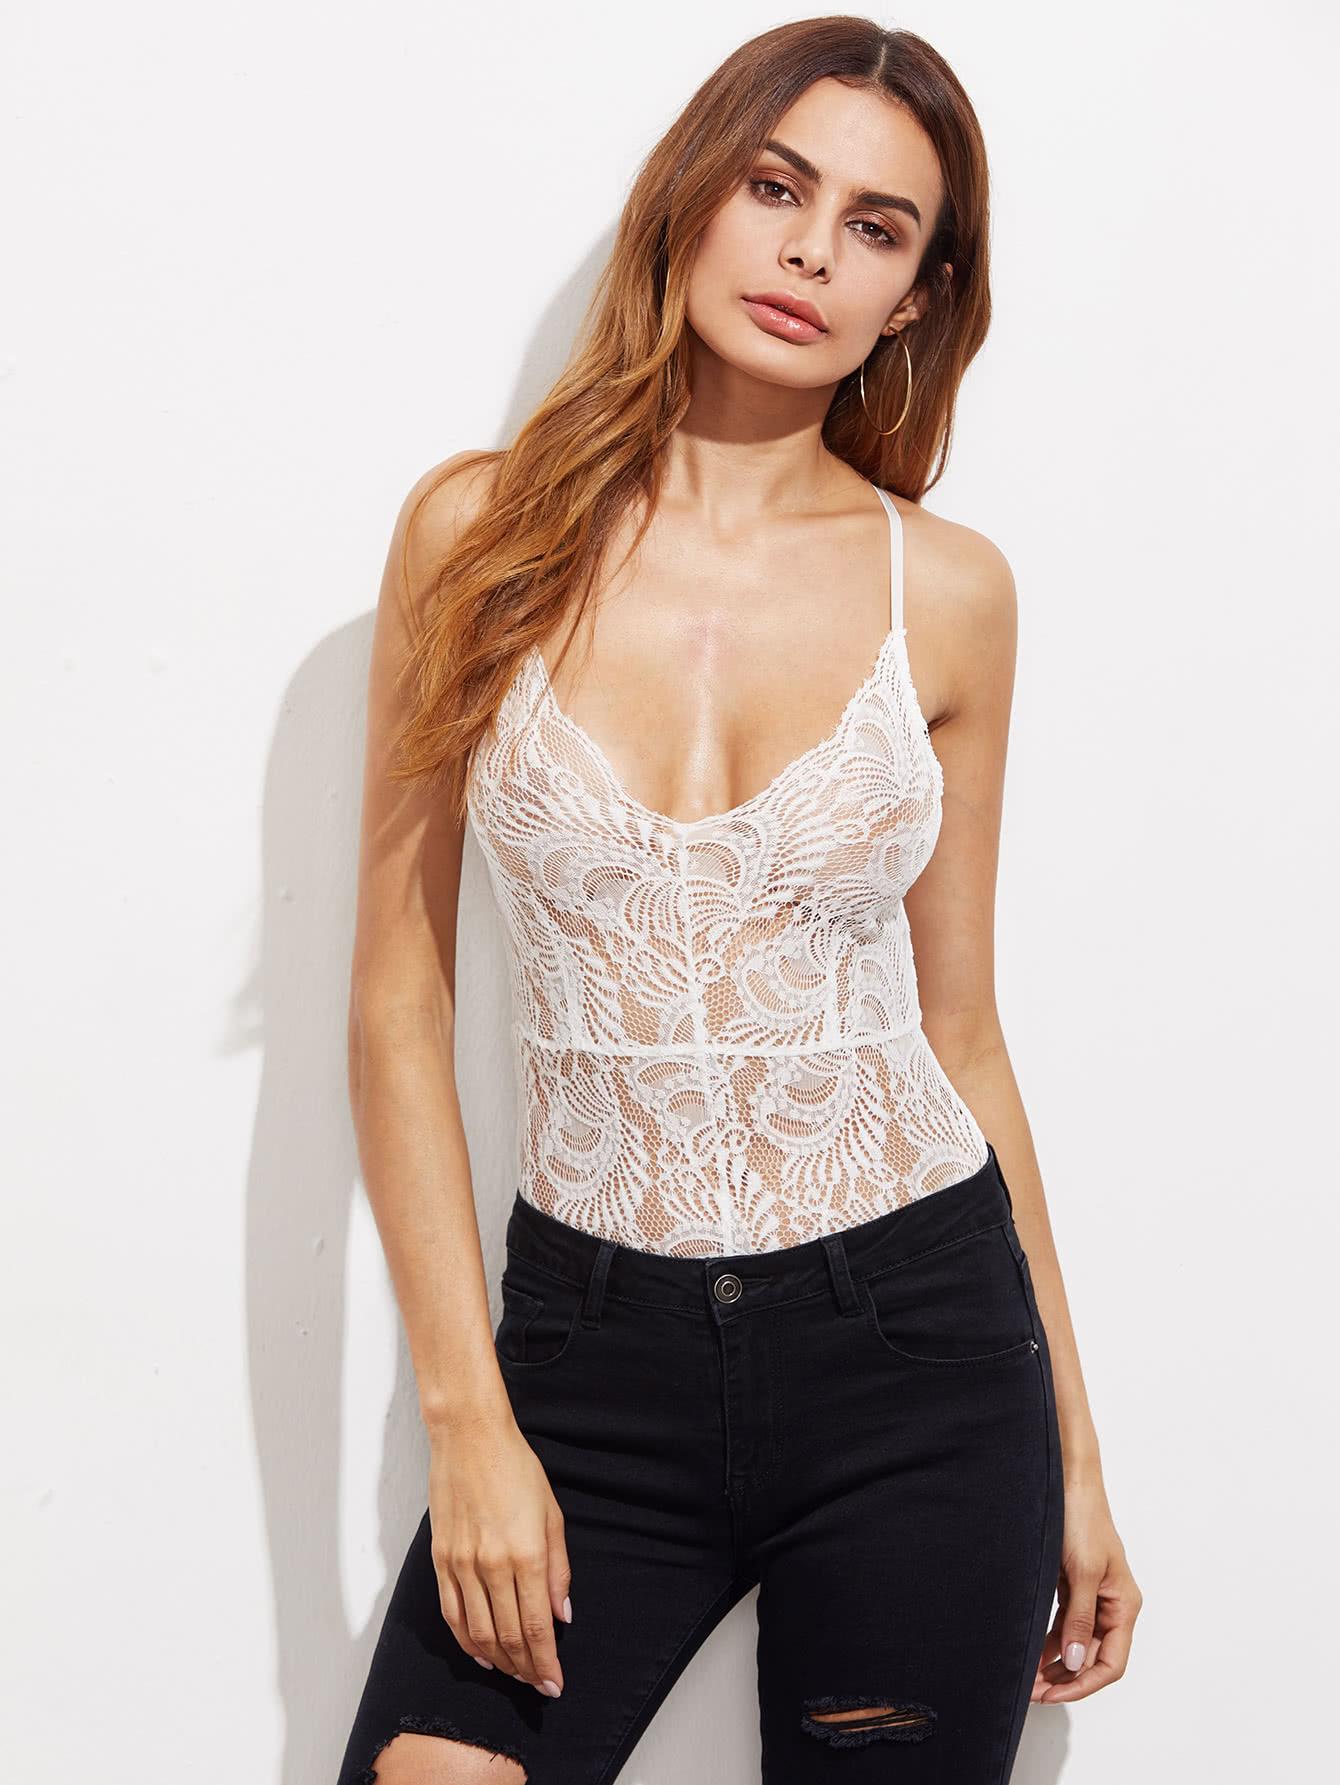 Crisscross Back Sheer Lace Bodysuit bodysuit170516703